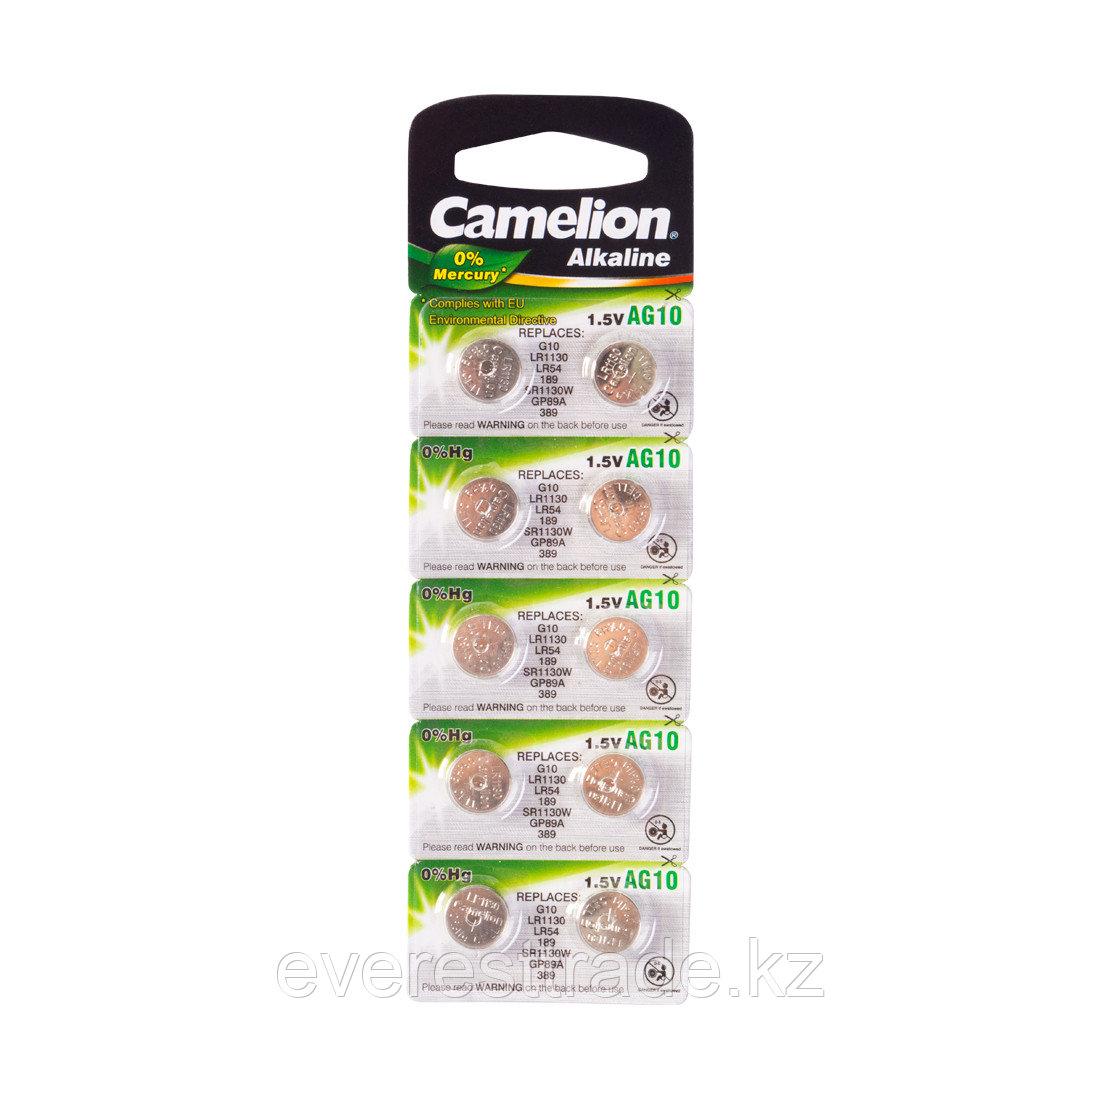 Camelion Батарейки,CAMELION, AG10-BP10, Alkaline, AG10, 1.5V, 0% Ртути, 10 шт. в блистере